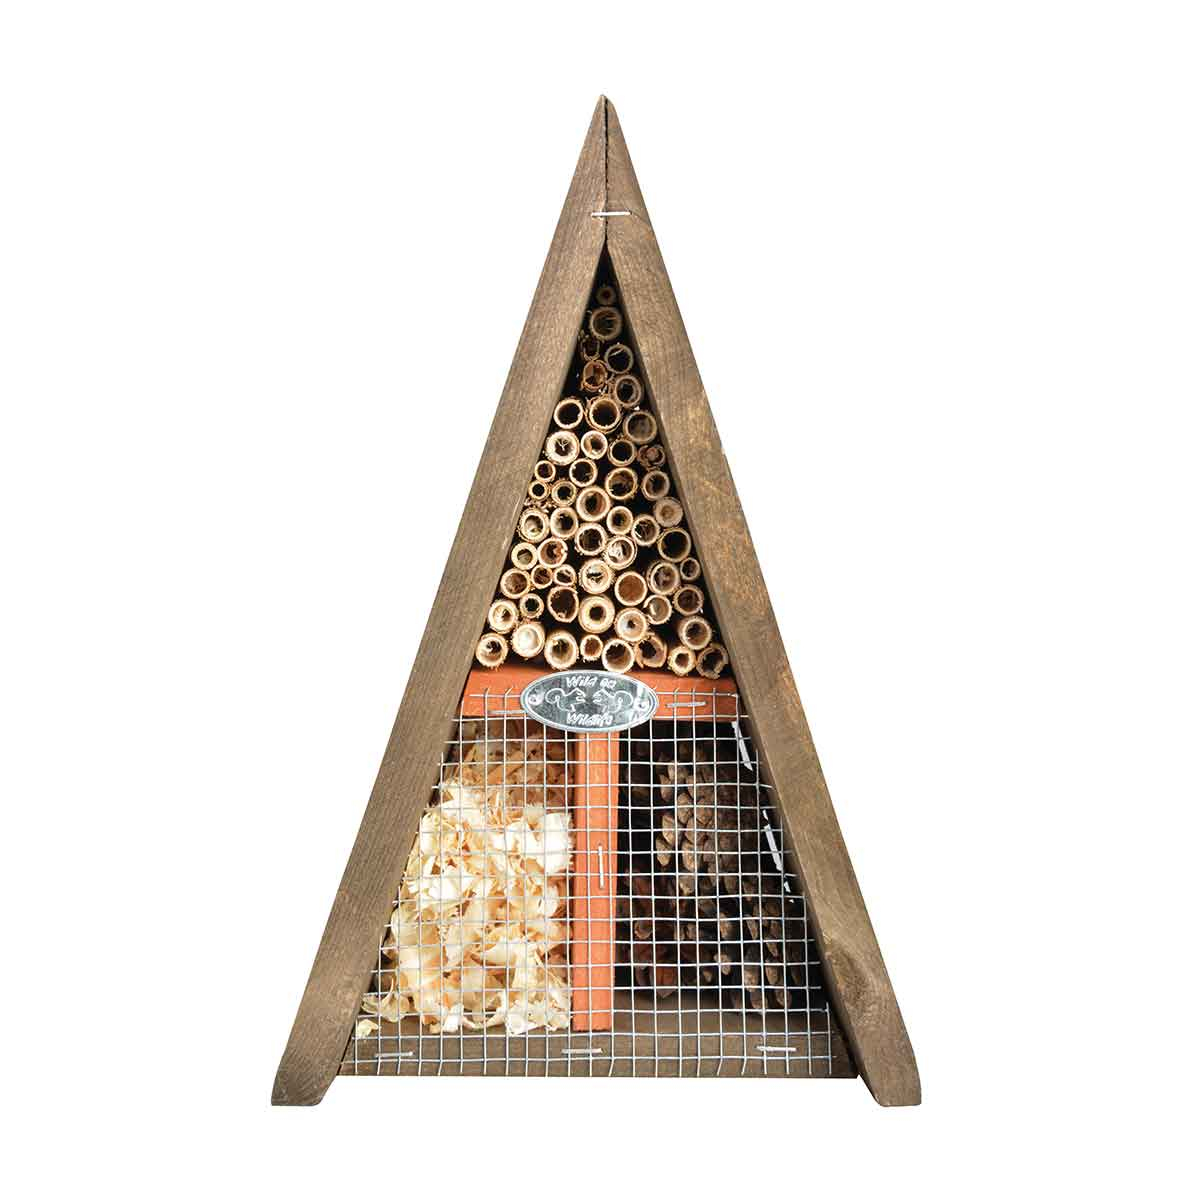 Hôtel À insectes triangulaire - esschert design